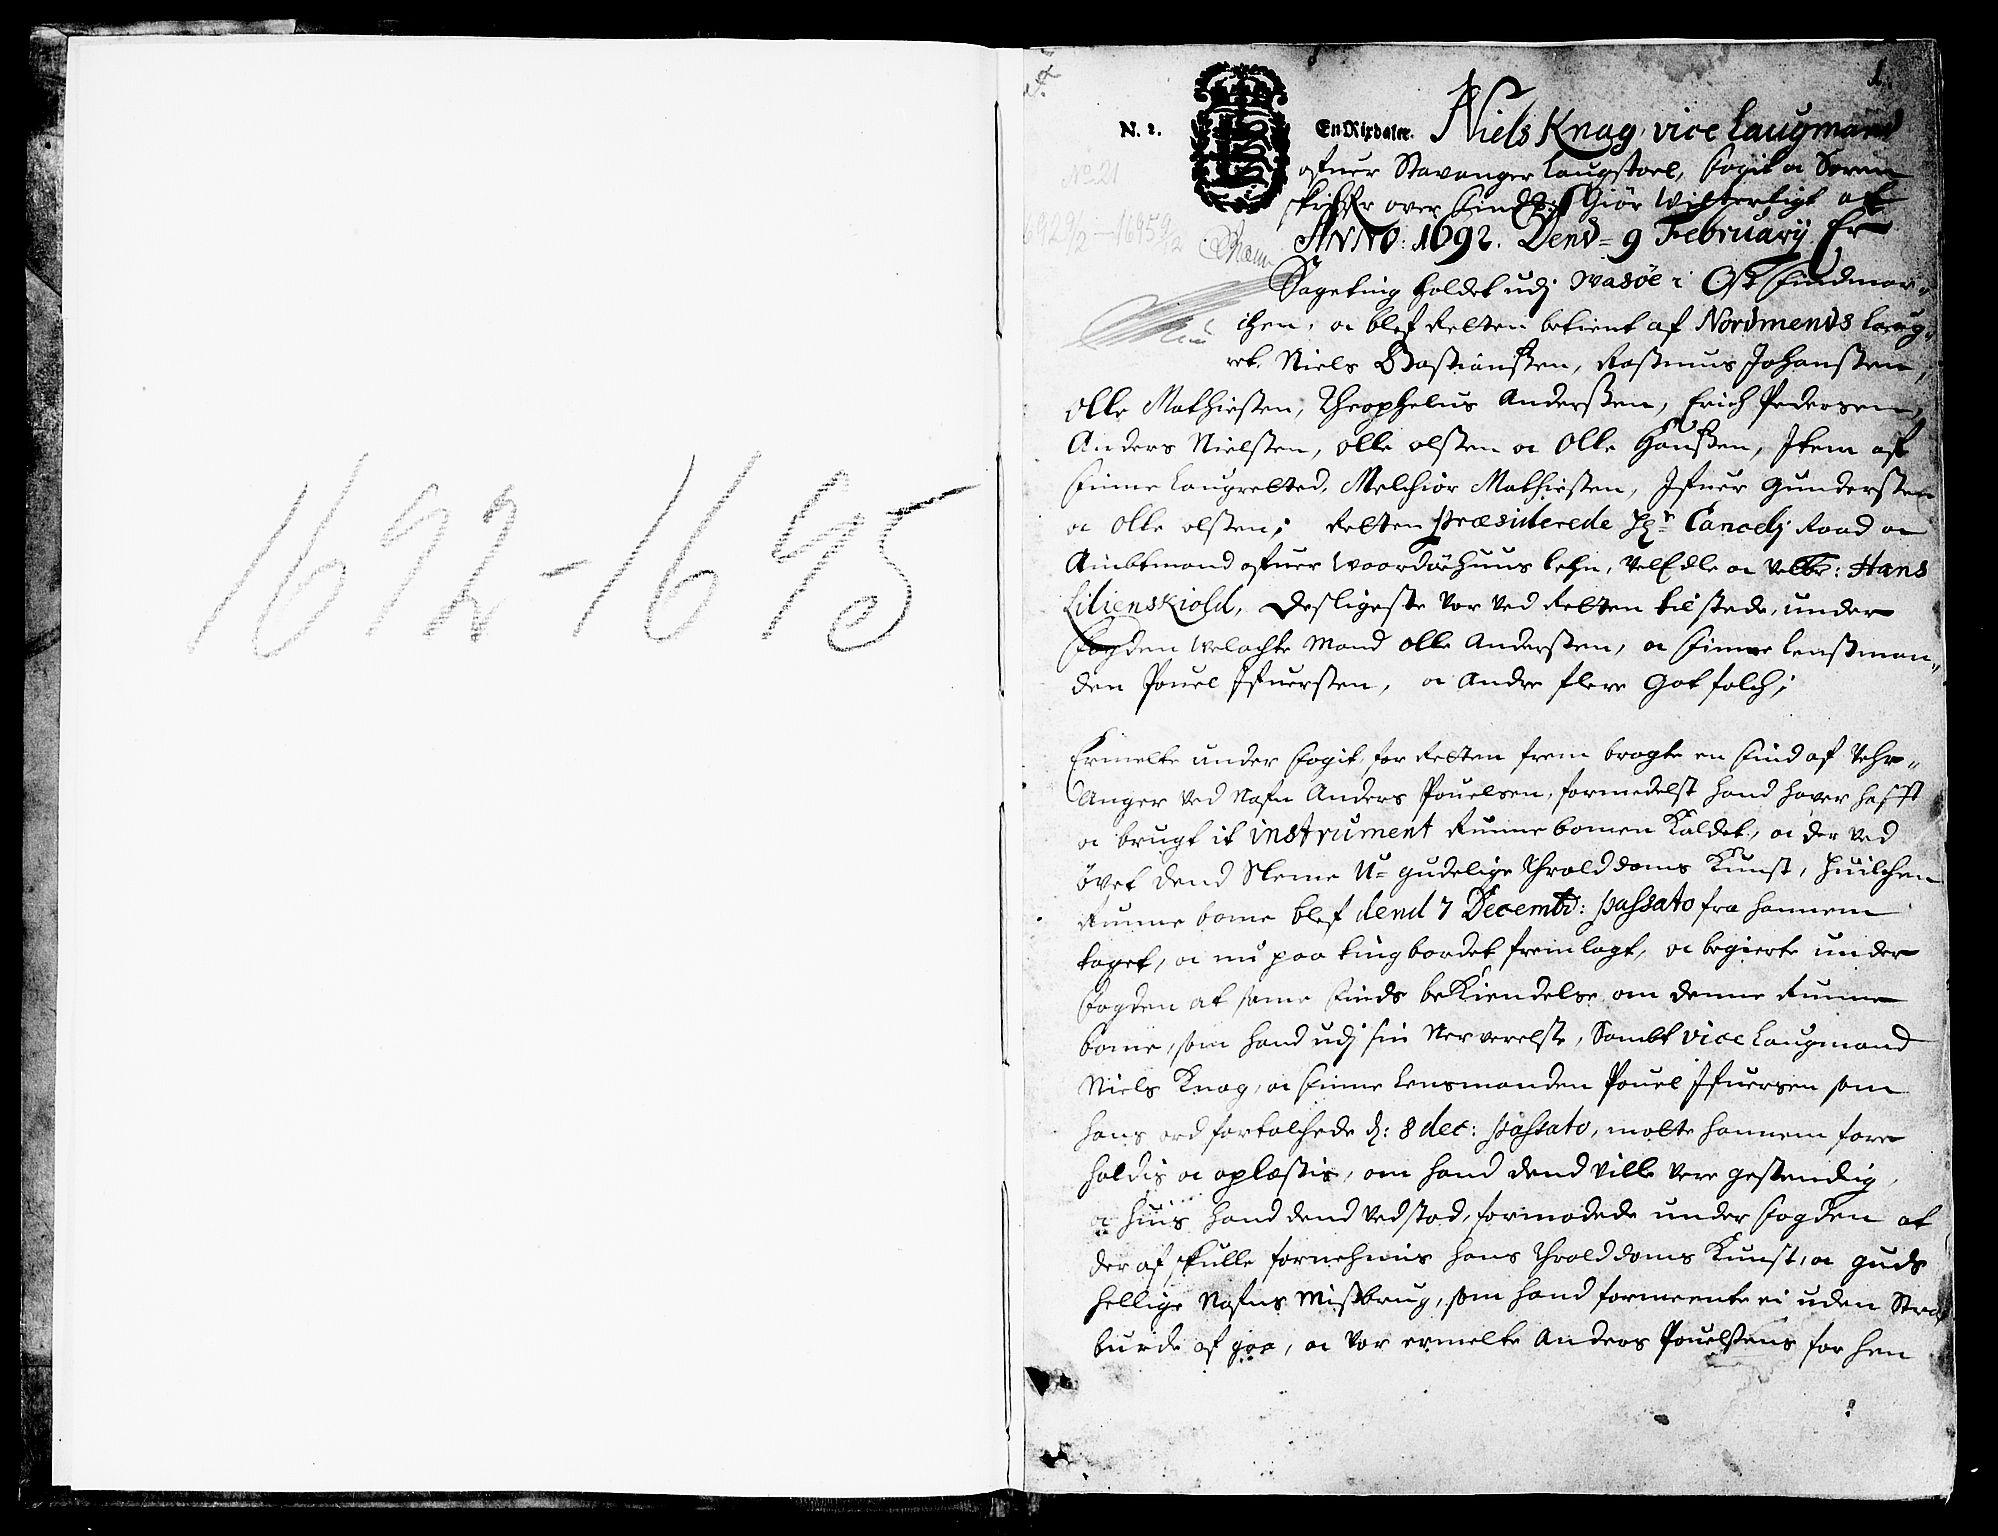 SATØ, Finnmark sorenskriveri, F/Fa/L0025: Justisprotokoller, 1692-1695, s. 0b-1a